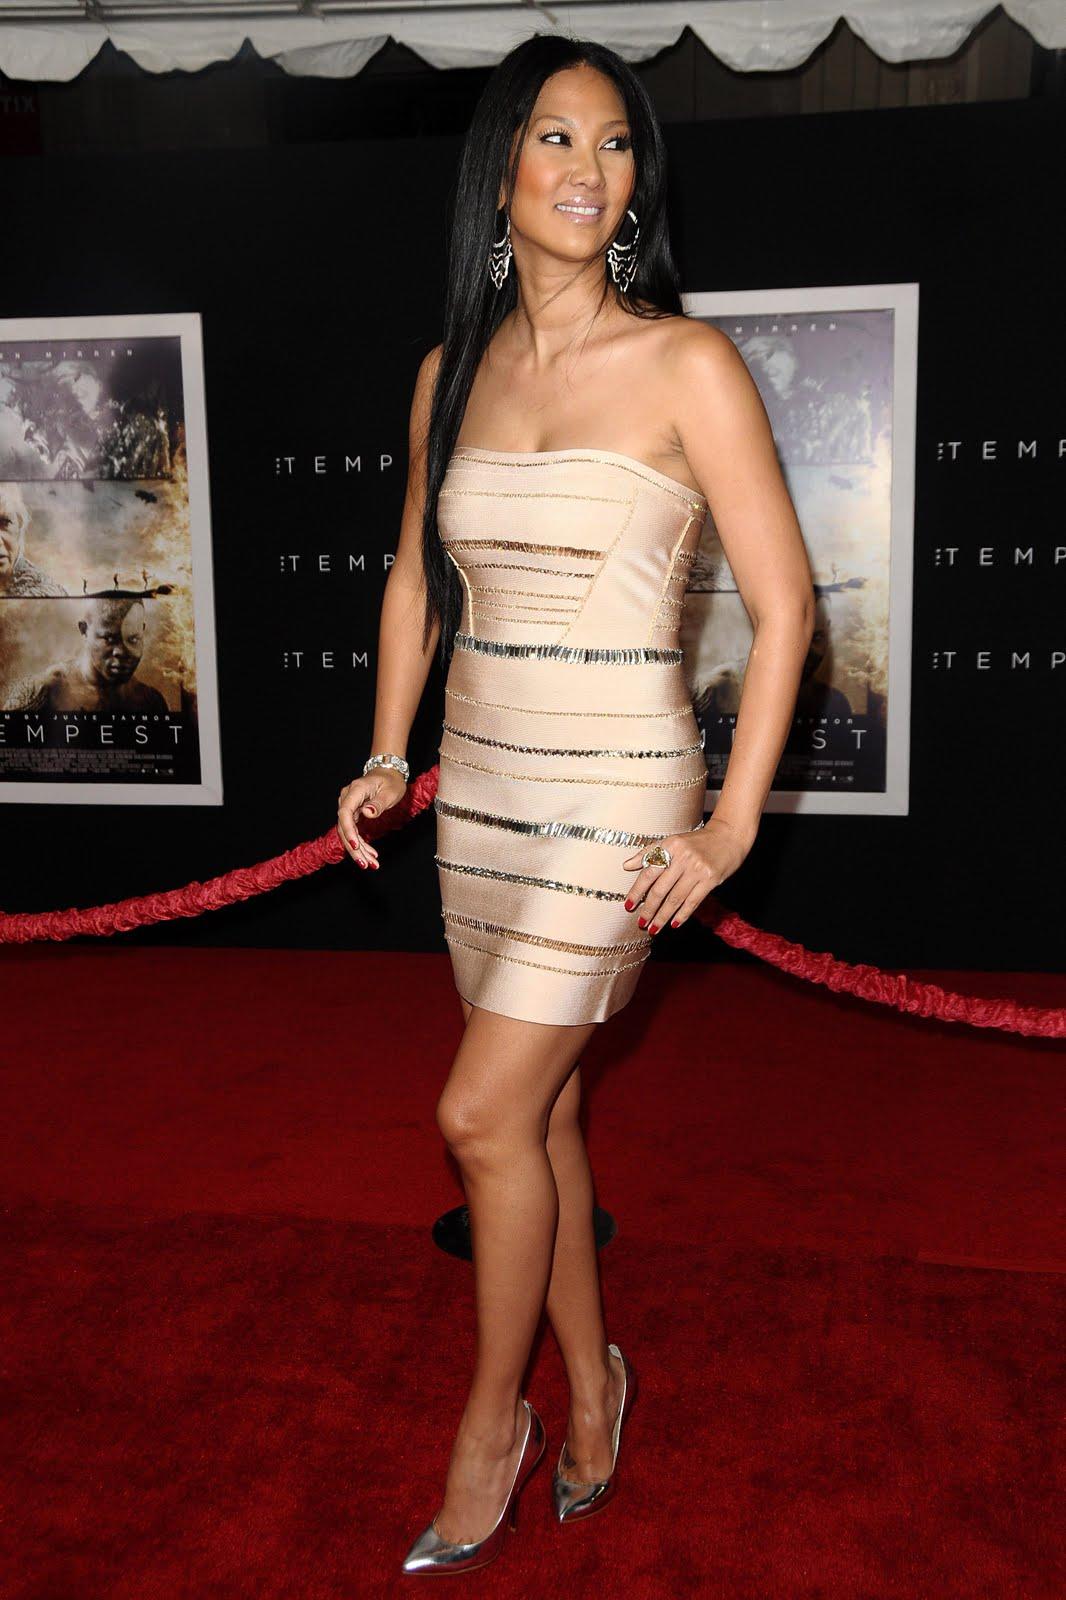 Kimora Lee Simmons The Tempest LA Premiere 015 122 696lo Start Slideshow ...